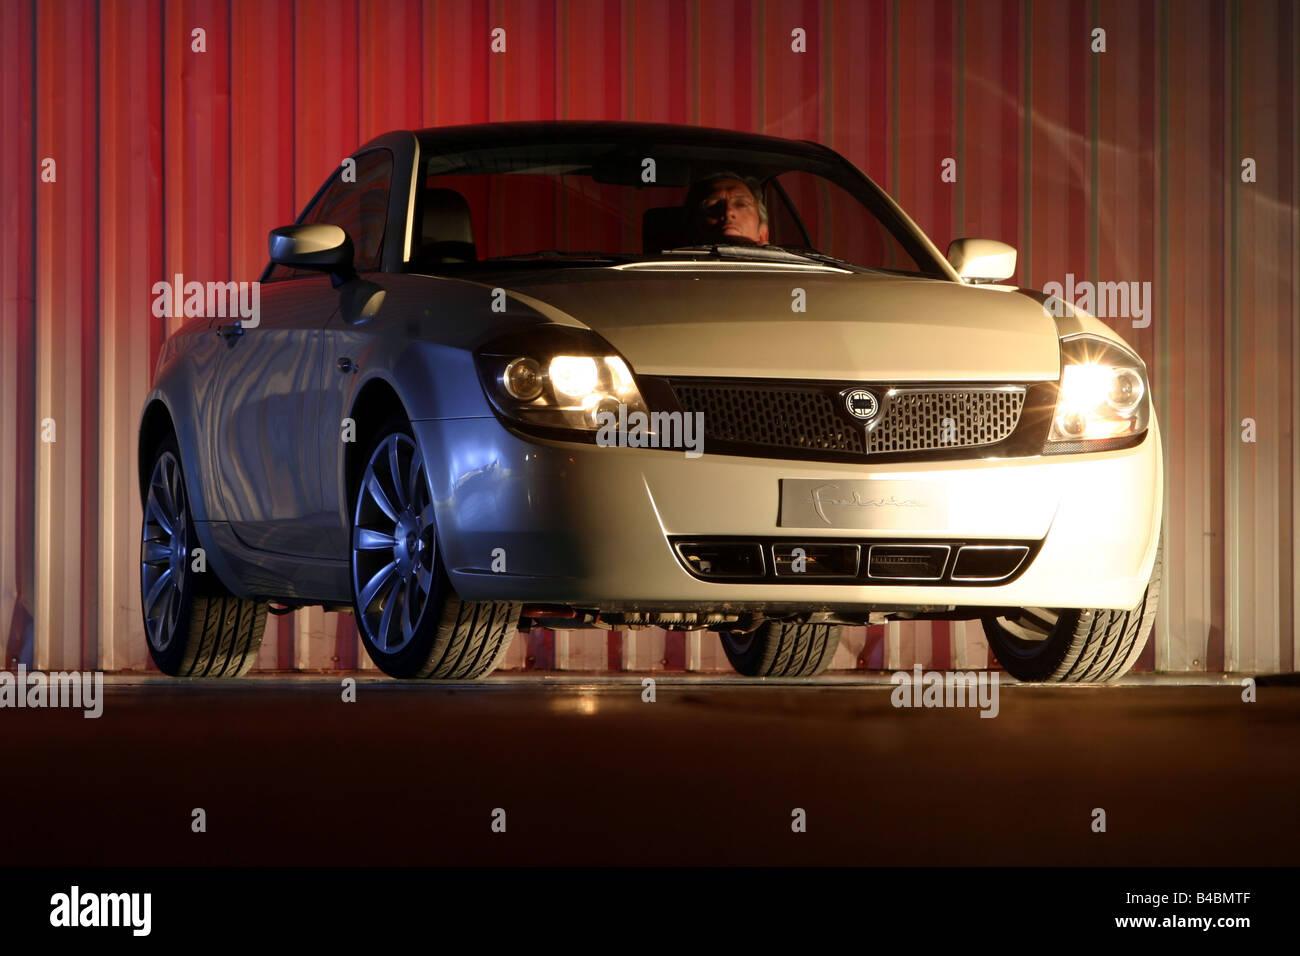 https://c8.alamy.com/comp/B4BMTF/car-lancia-fulvia-study-draft-and-design-study-model-year-2003-silver-B4BMTF.jpg